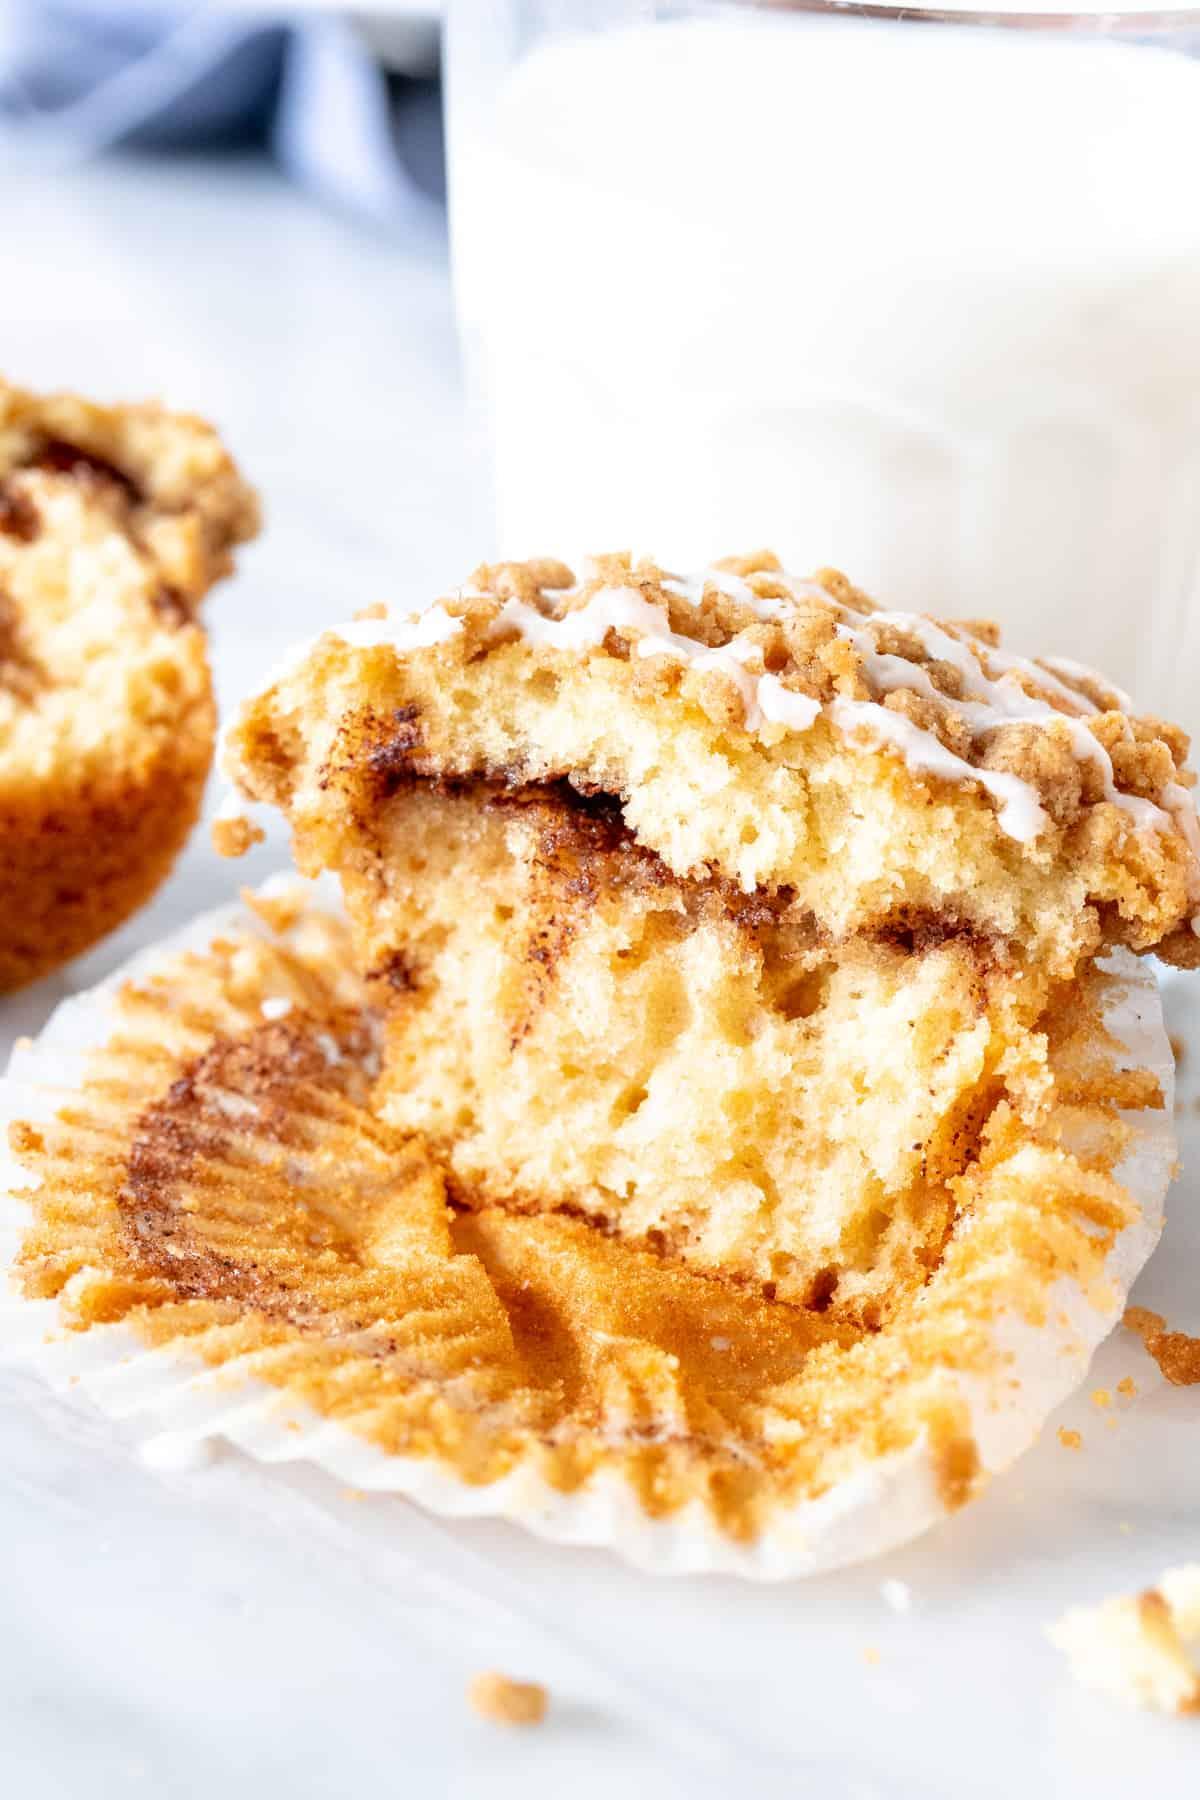 Cinnamon coffee cake muffin, broken in half with a glass of milk.